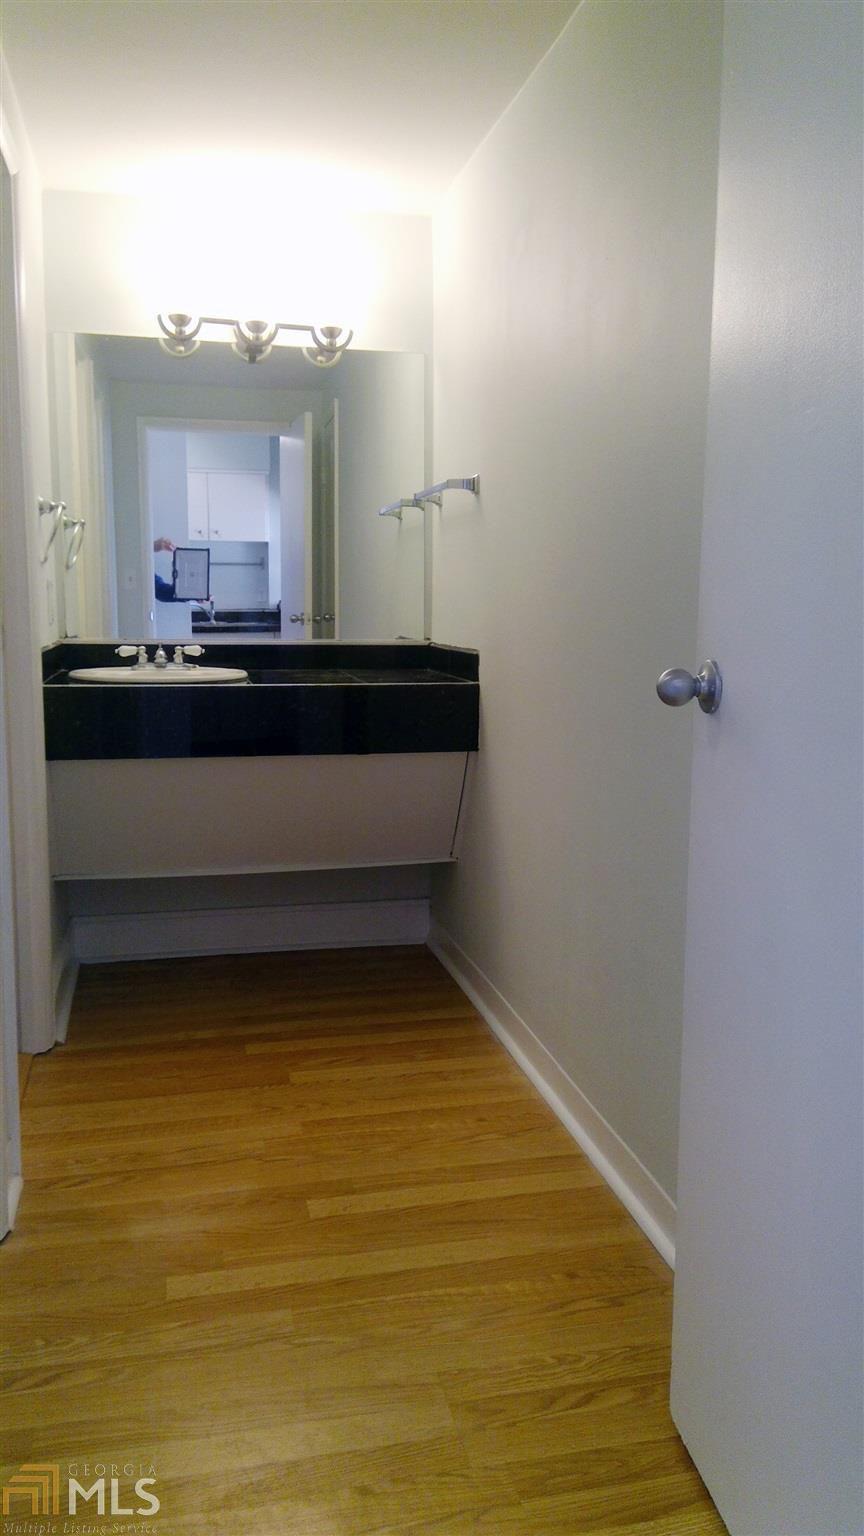 A white bathroom with wood floors.